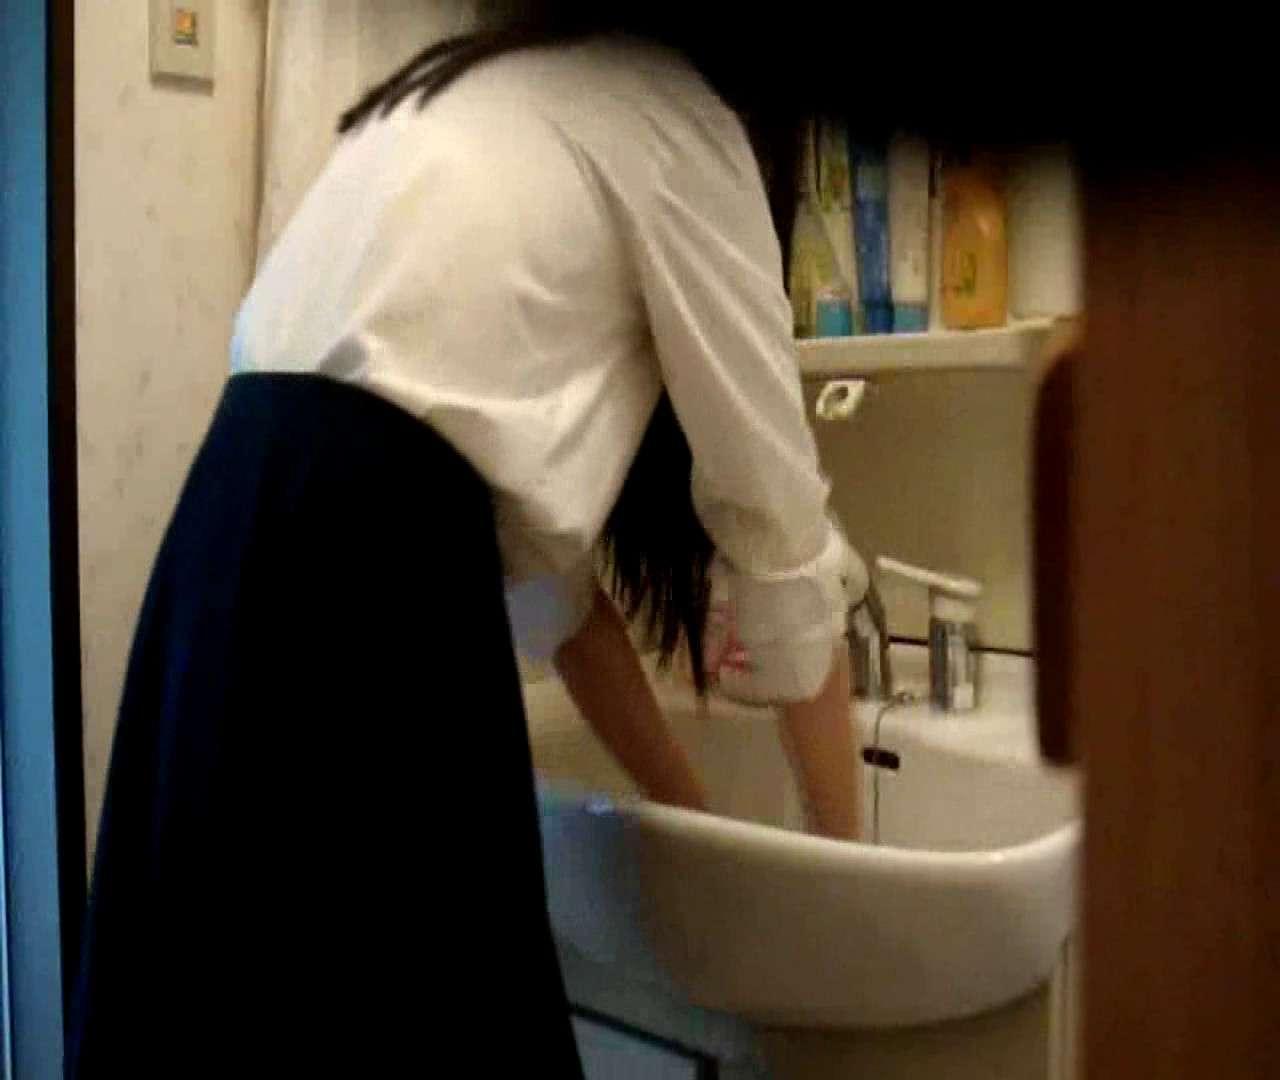 vol.5 まどかが帰宅後の洗顔後にブラを洗ってます。 ギャル達 | 民家  112枚 97